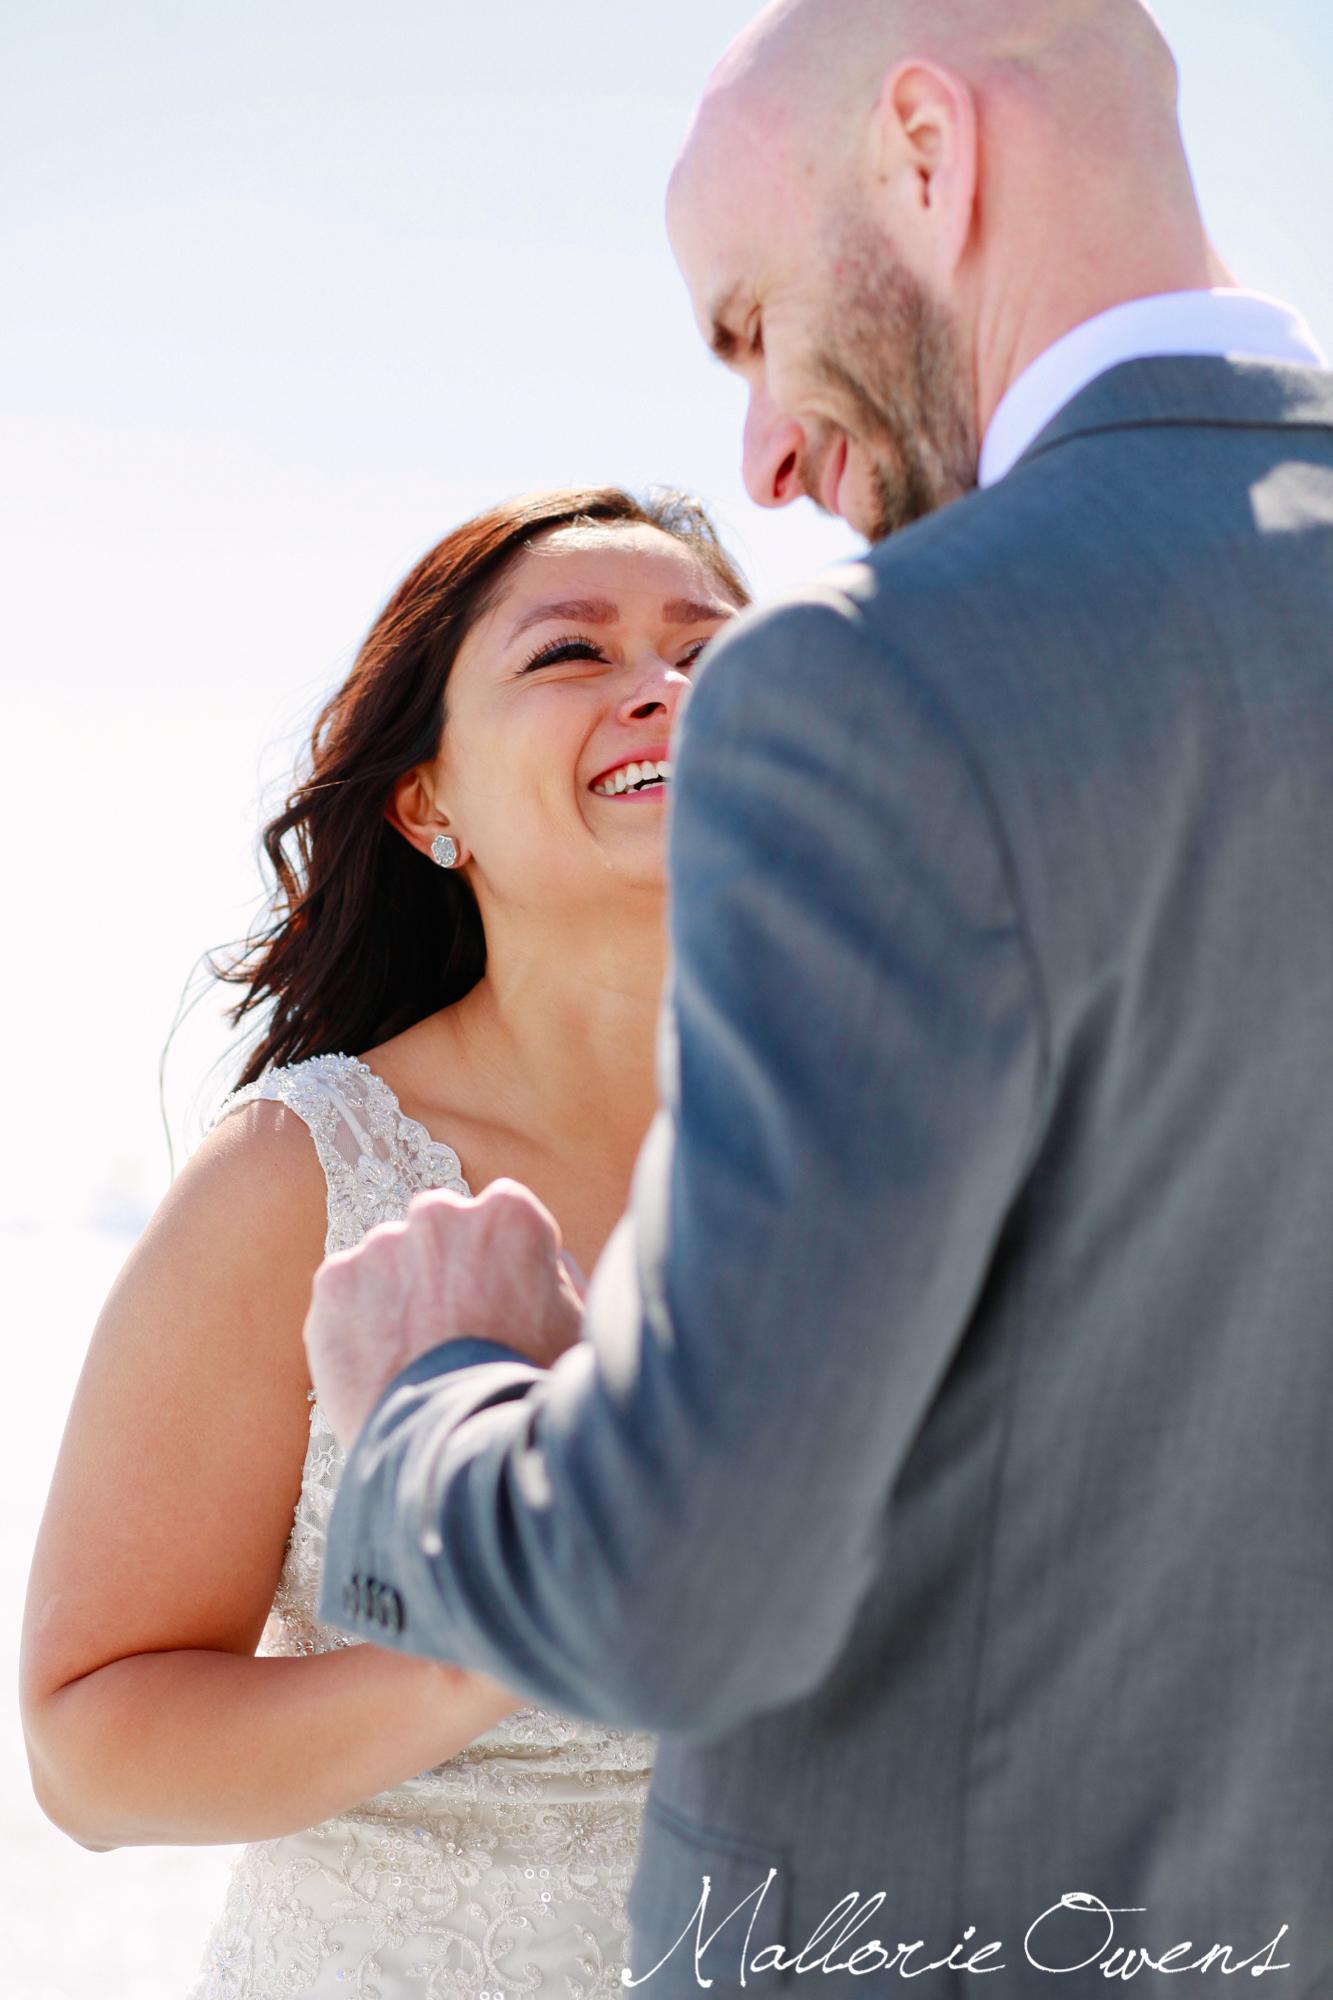 Wedding on Mendenhall Glacier in Juneau, Alaska | MALLORIE OWENS